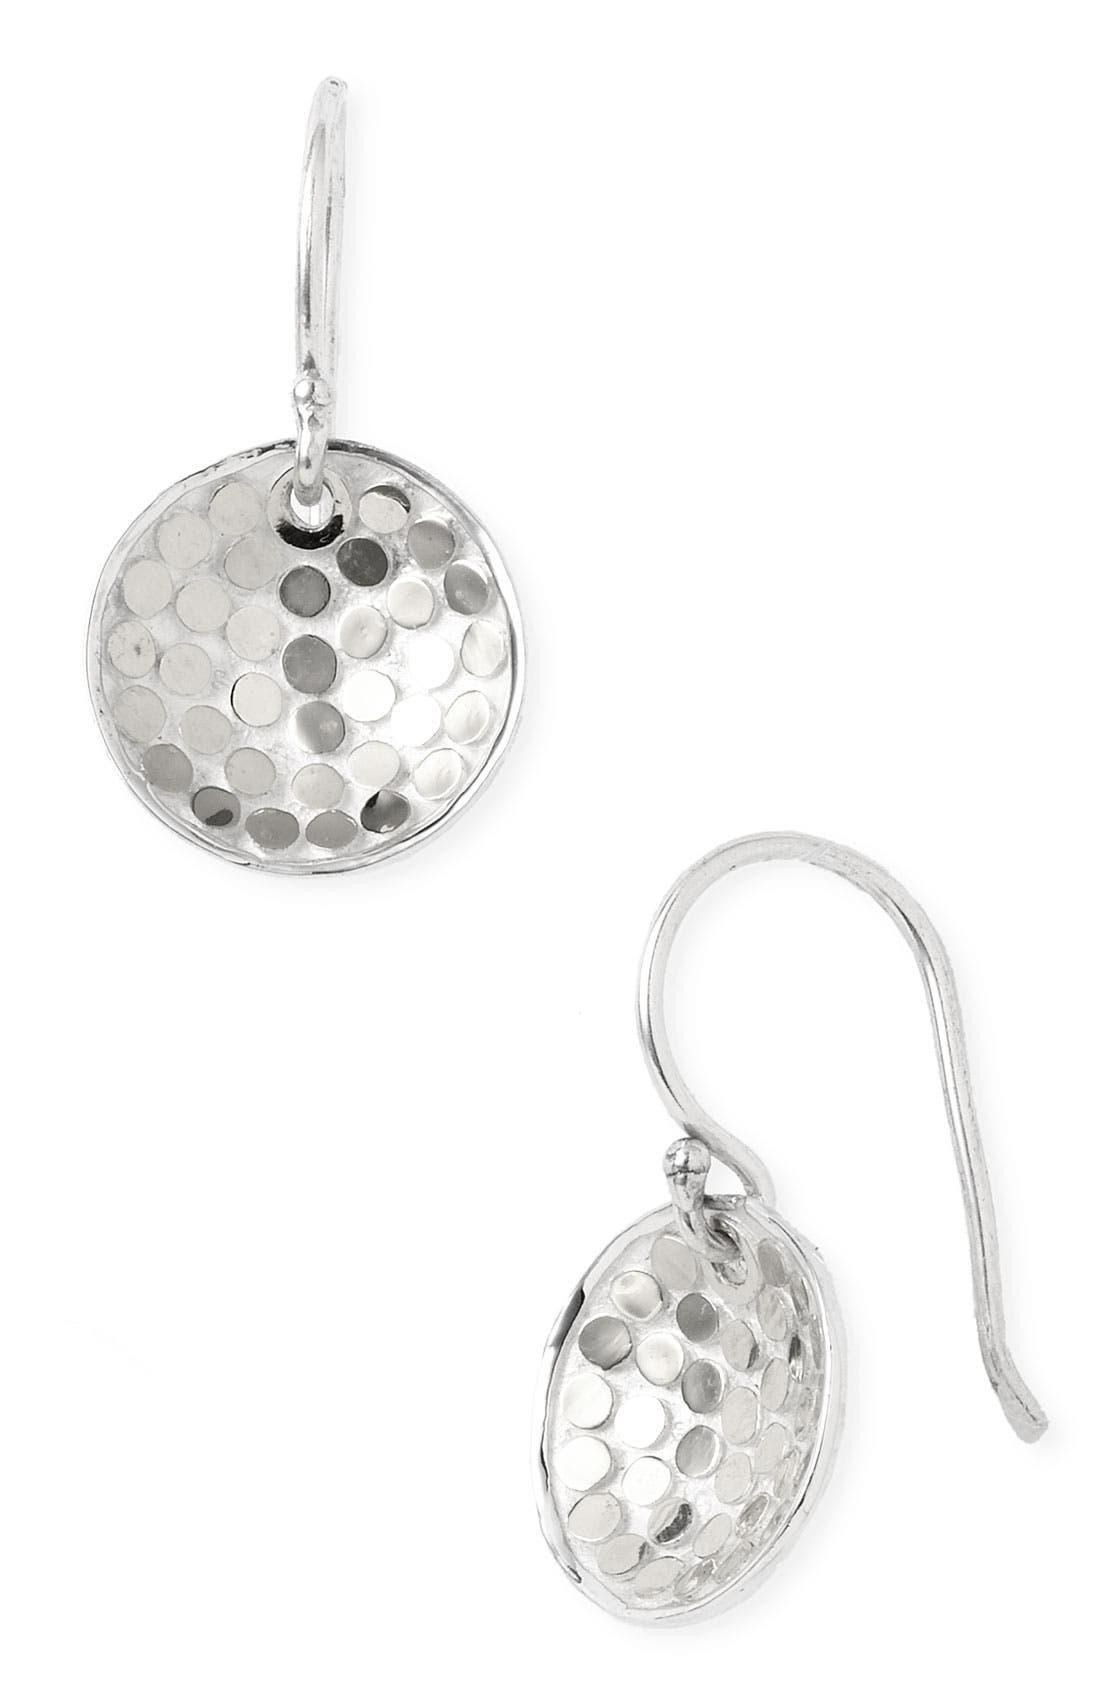 Main Image - Anna Beck 'Bali' Dish Earrings